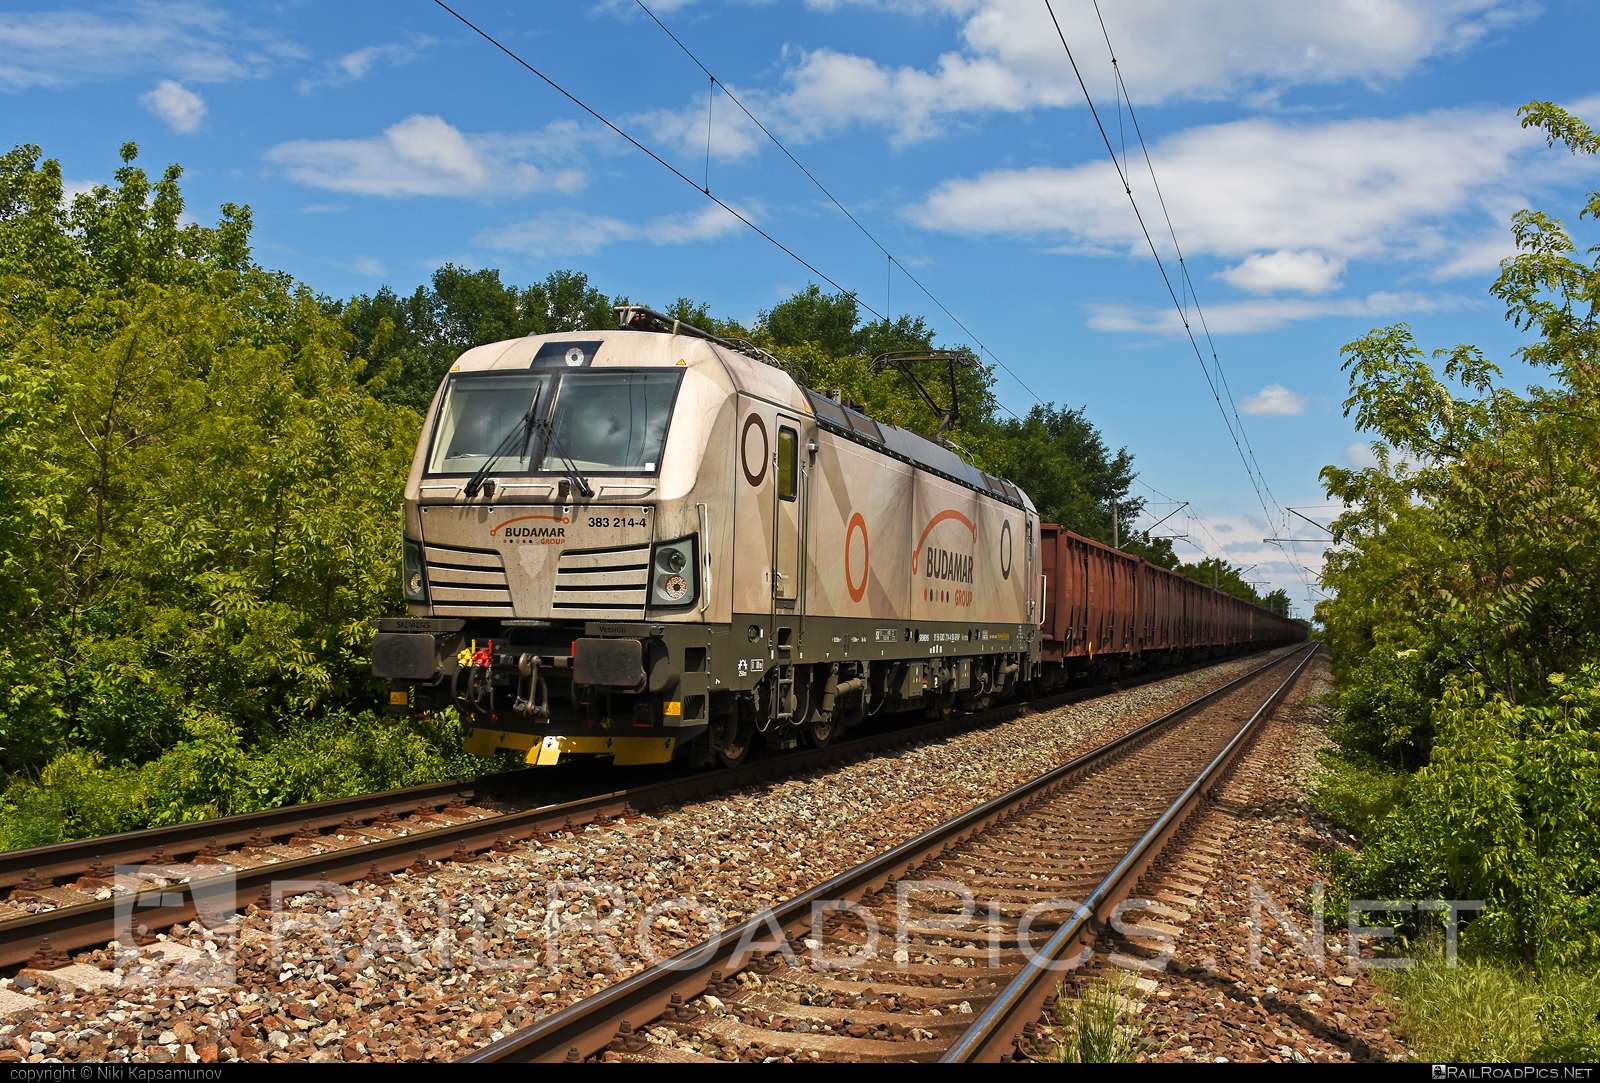 Siemens Vectron MS - 383 214-4 operated by LOKORAIL, a.s. #budamar #lokorail #lrl #siemens #siemensvectron #siemensvectronms #slovenskaplavbaapristavy #slovenskaplavbaapristavyas #spap #vectron #vectronms